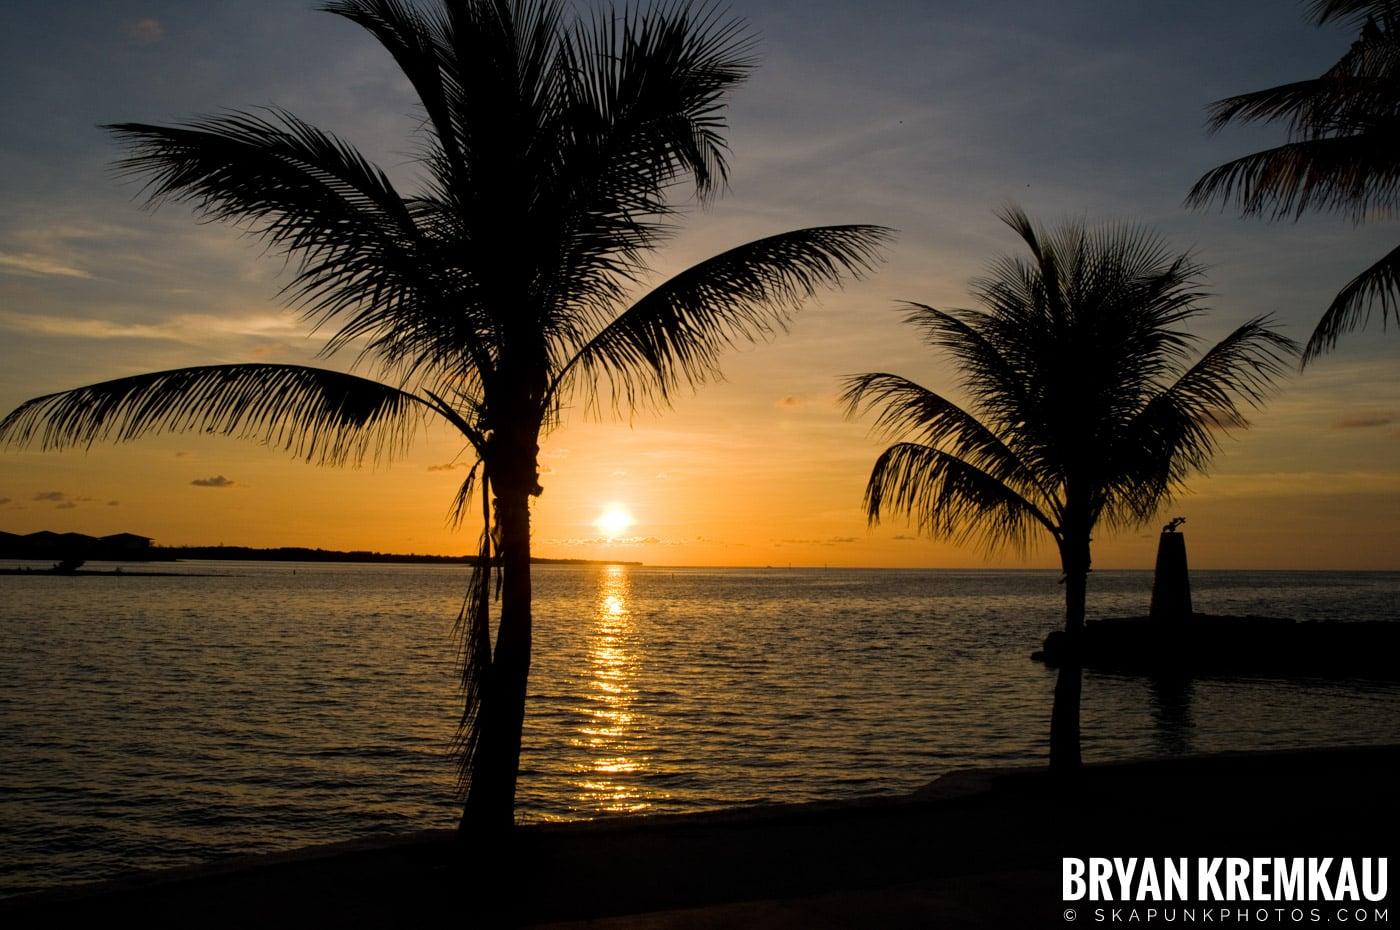 Florida Keys Vacation - 7.09.10 - 7.15.10 (56)